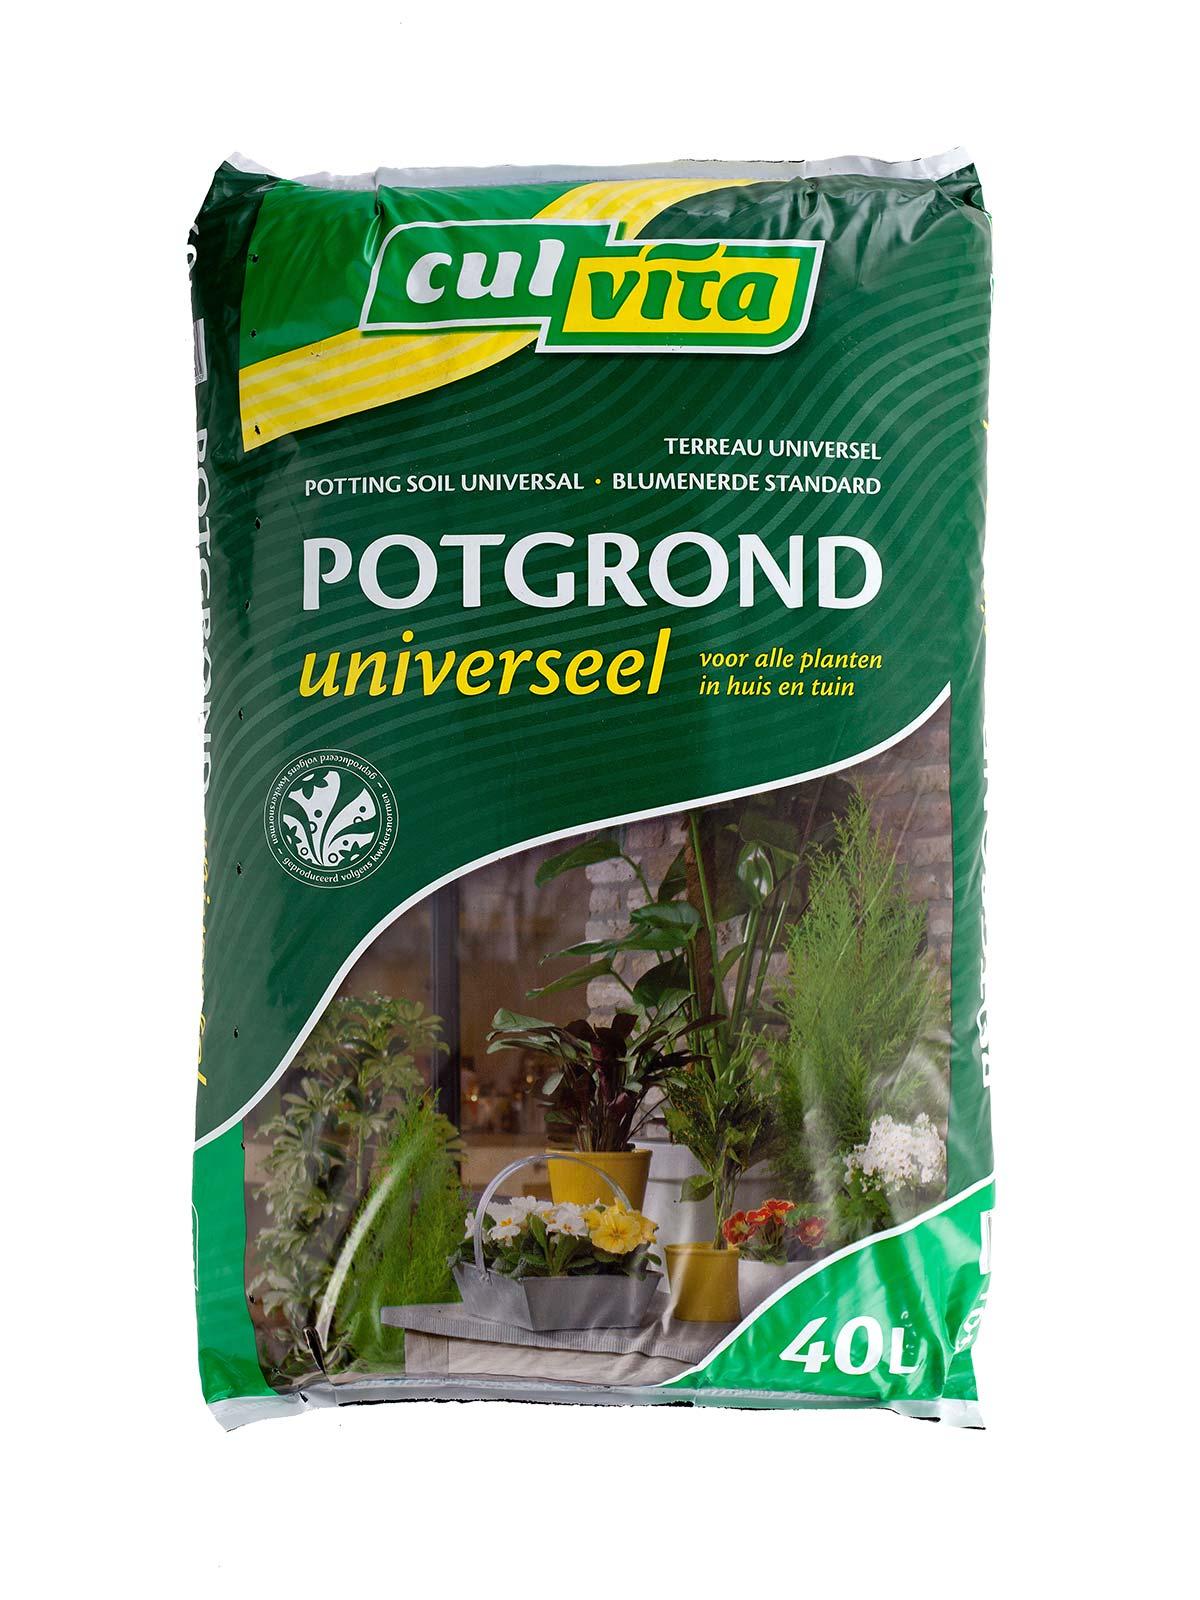 Culvita Potgrond Universeel | Culvita.nl